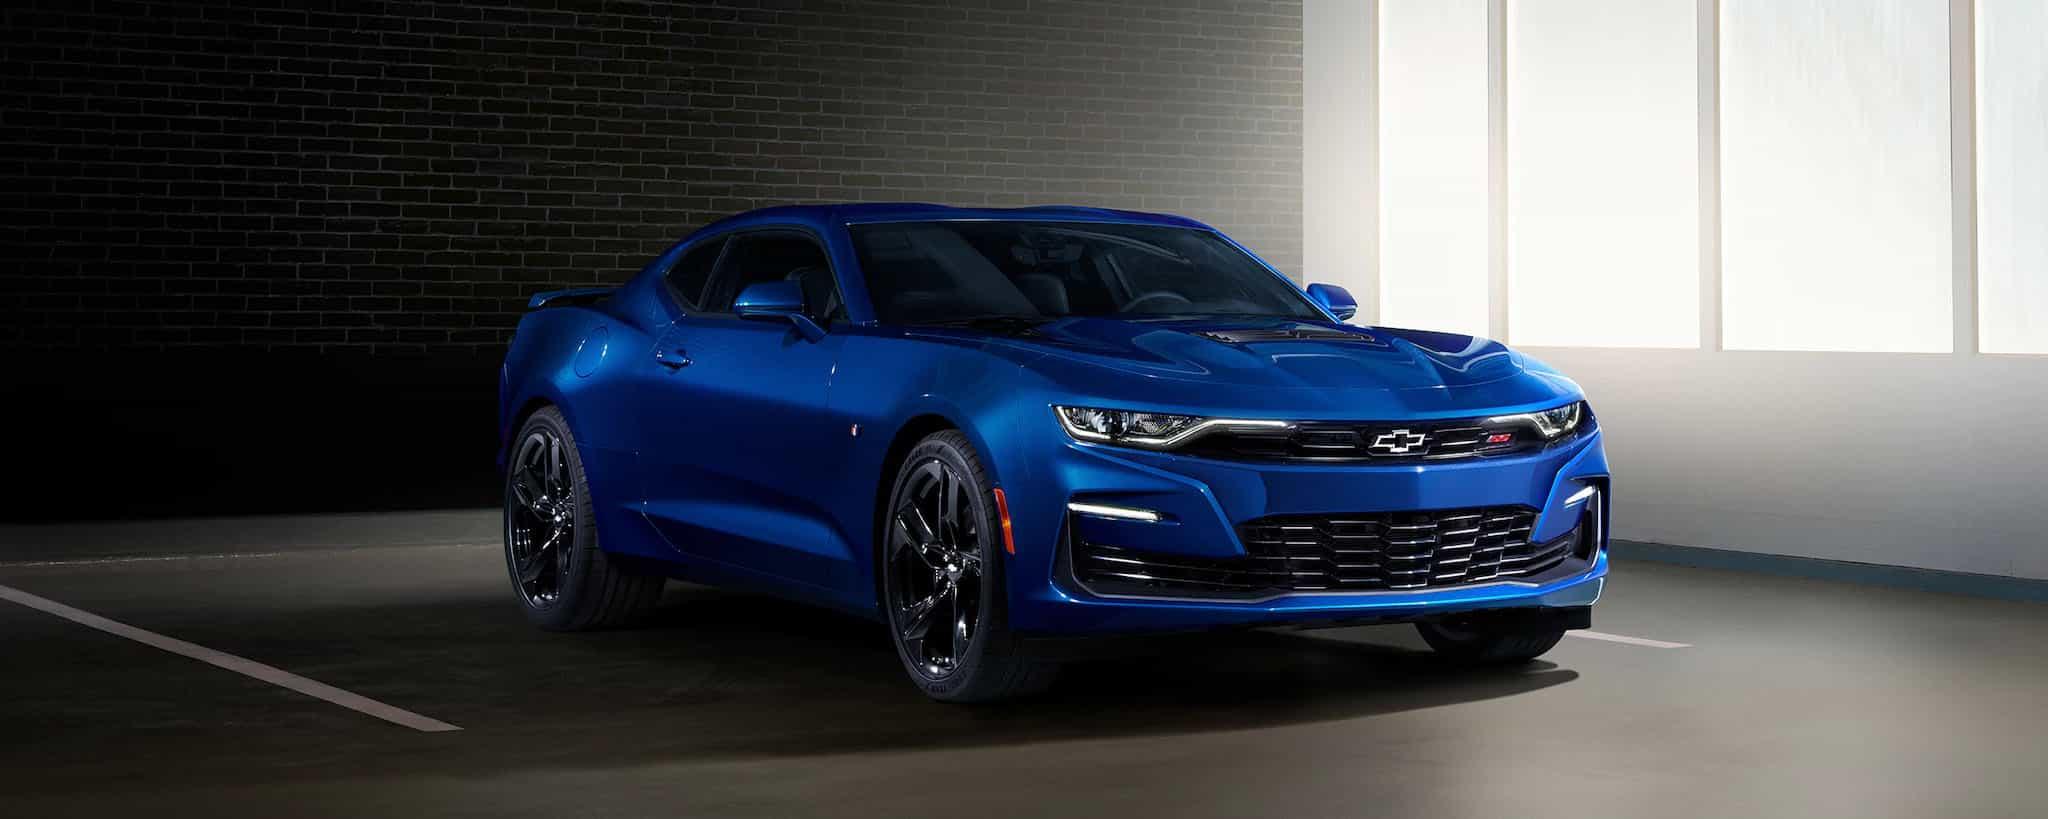 Chevrolet Camaro 2021 blu